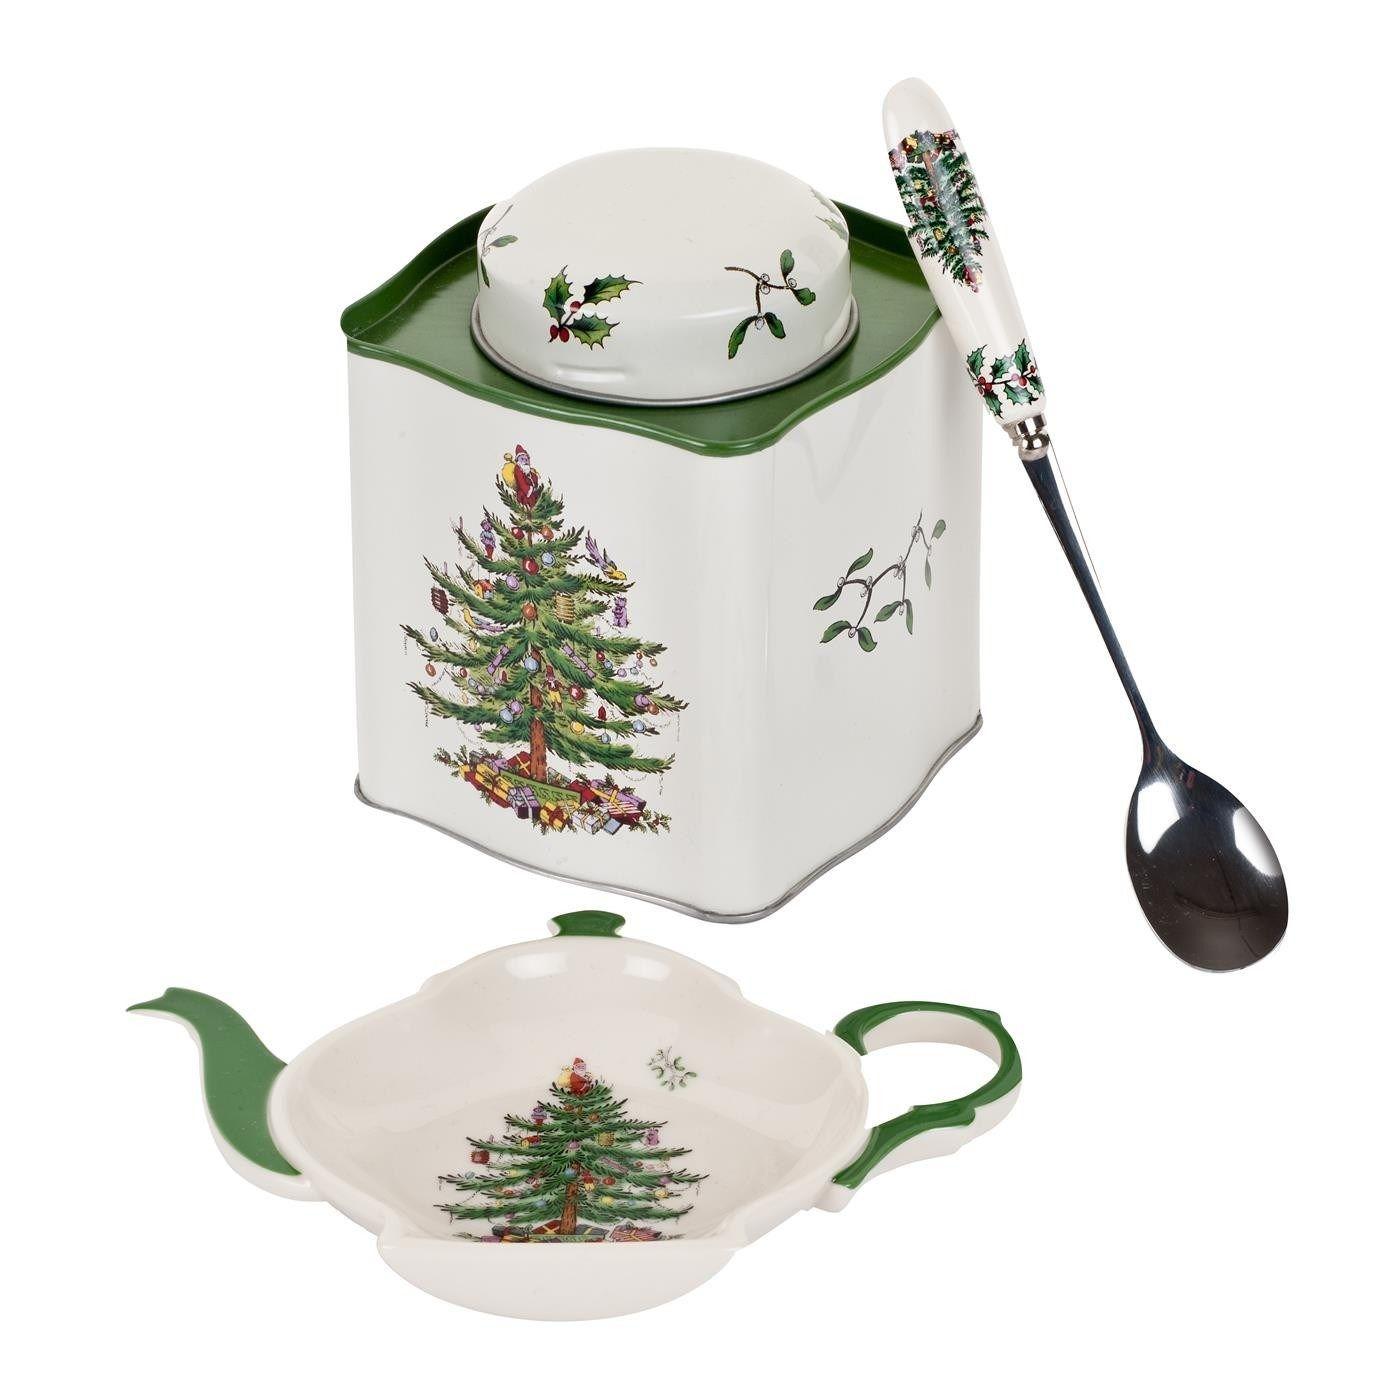 Pimpernel 2019008338 Christmas Tree 3 Piece Tea Set Spode Christmas Spode Christmas Tree Christmas Tableware